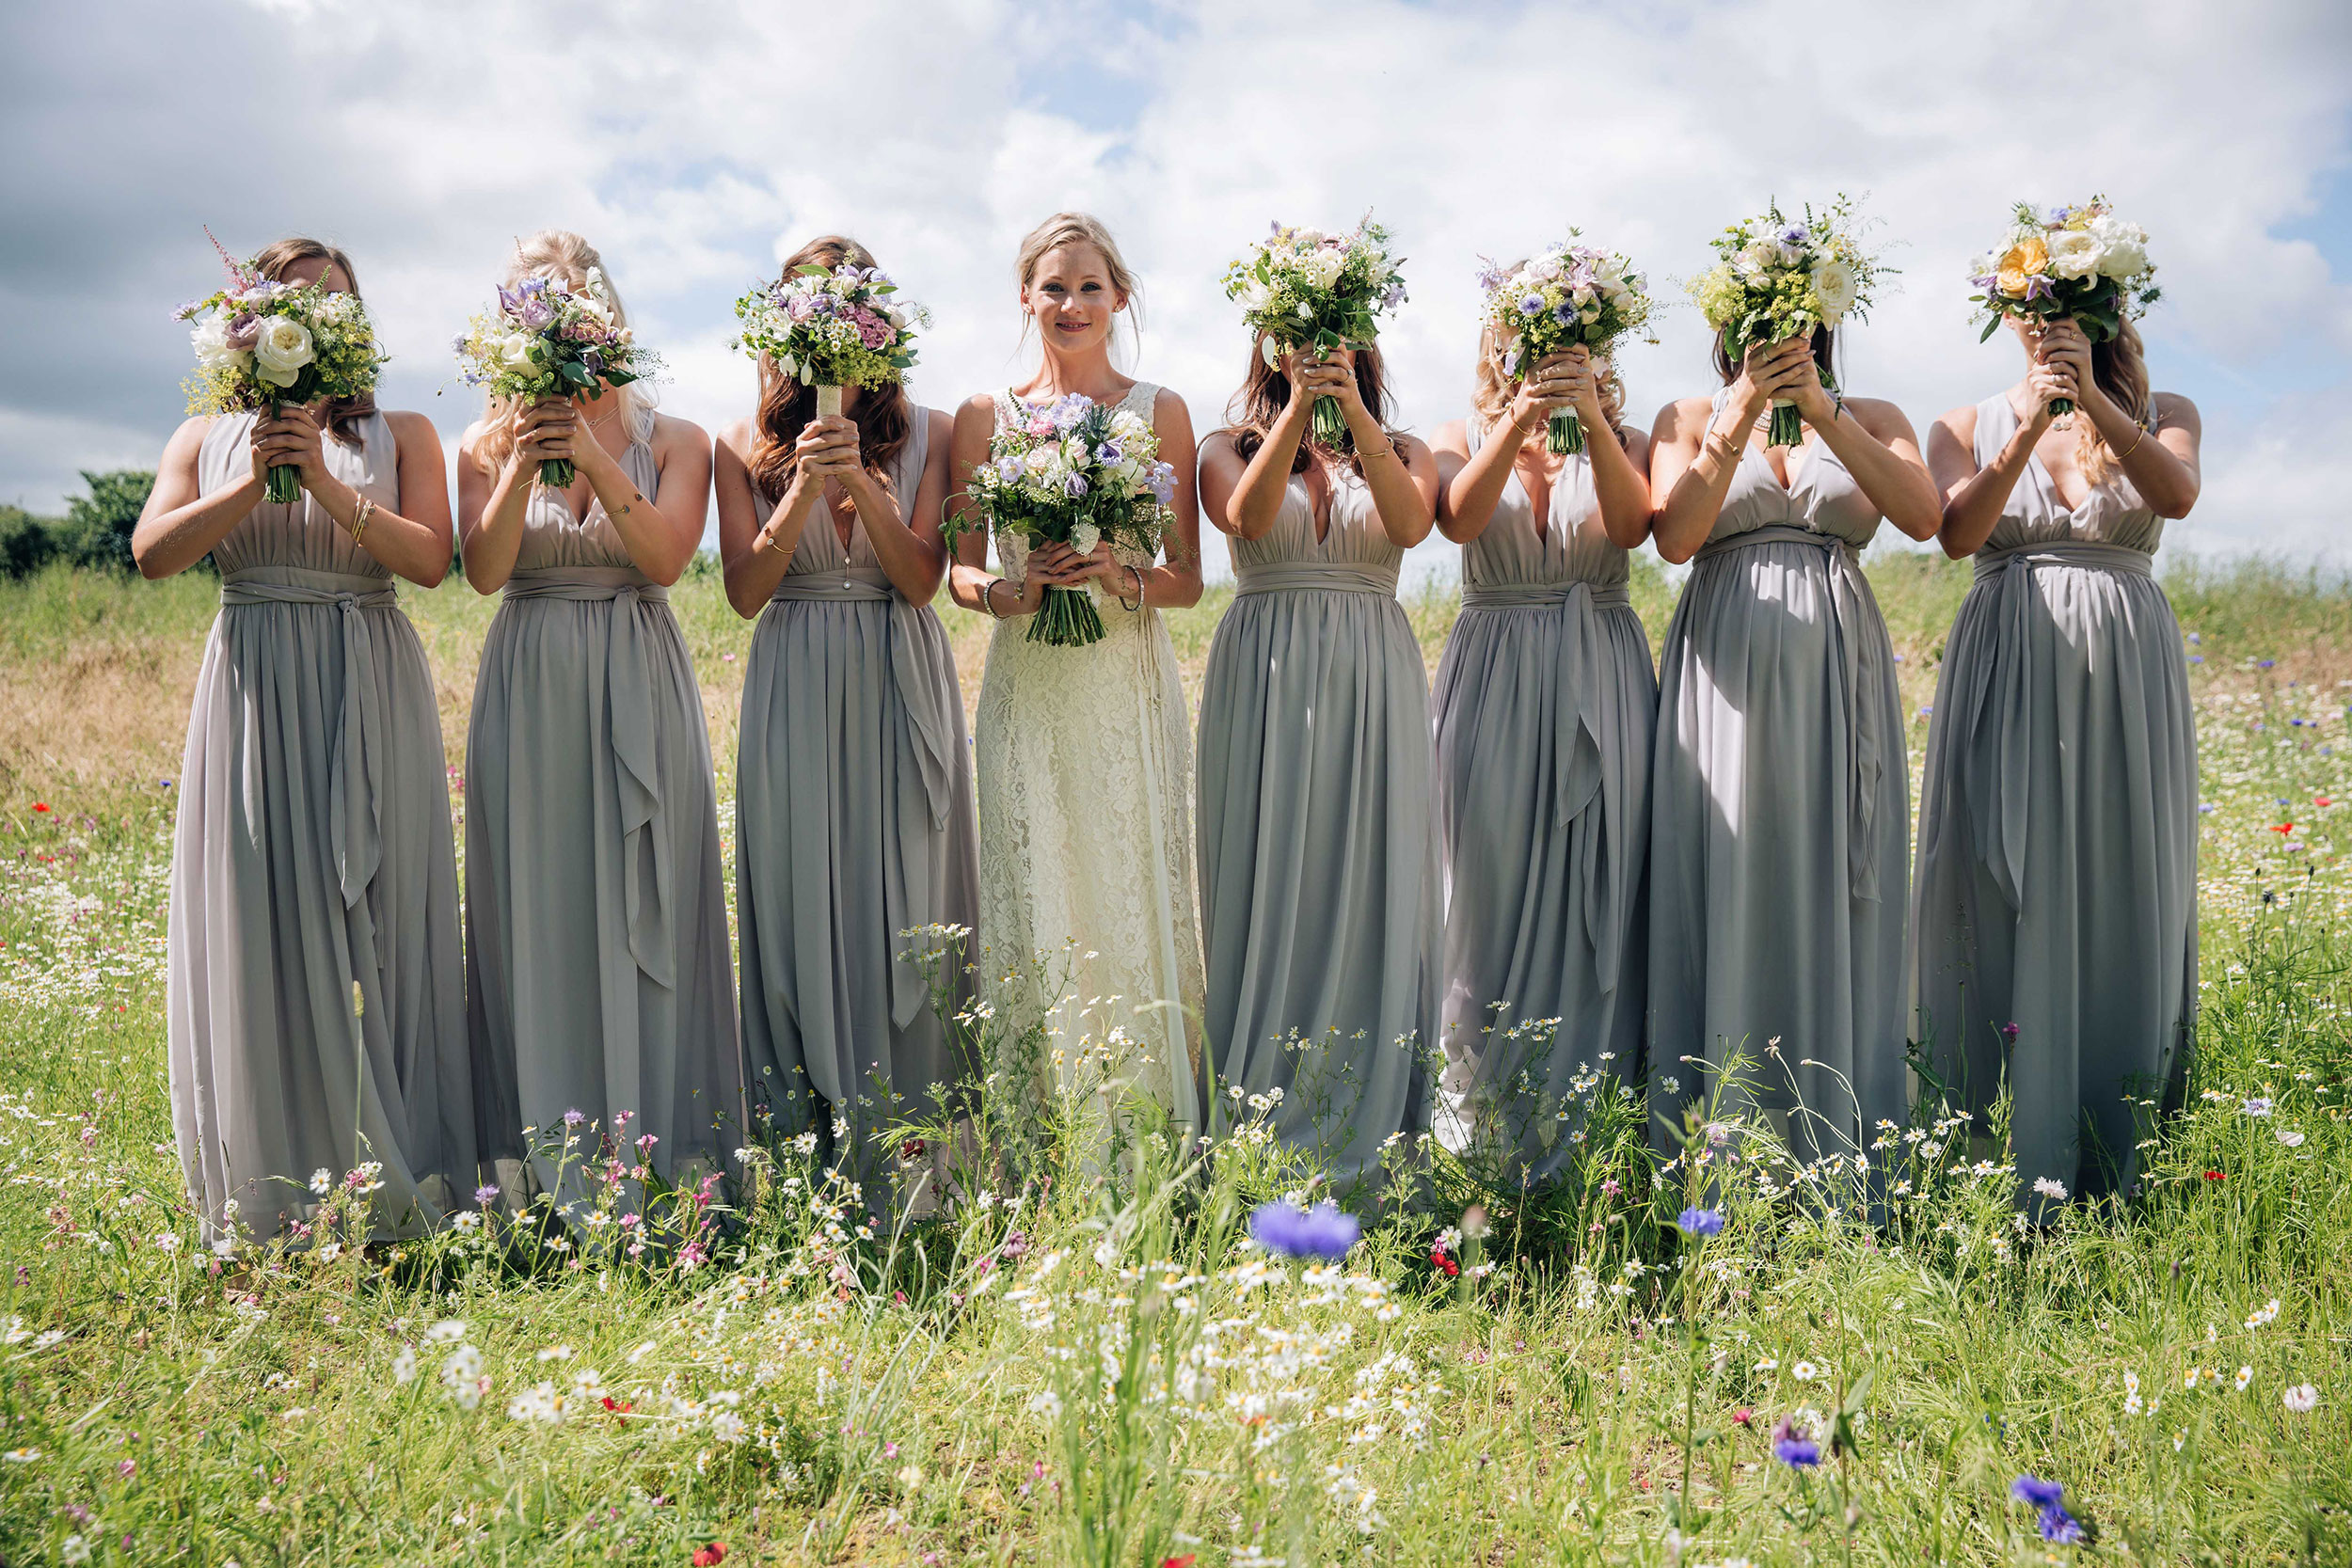 16.07.16-Tanya-&-Jethro-Wedding-Selection-45.jpg